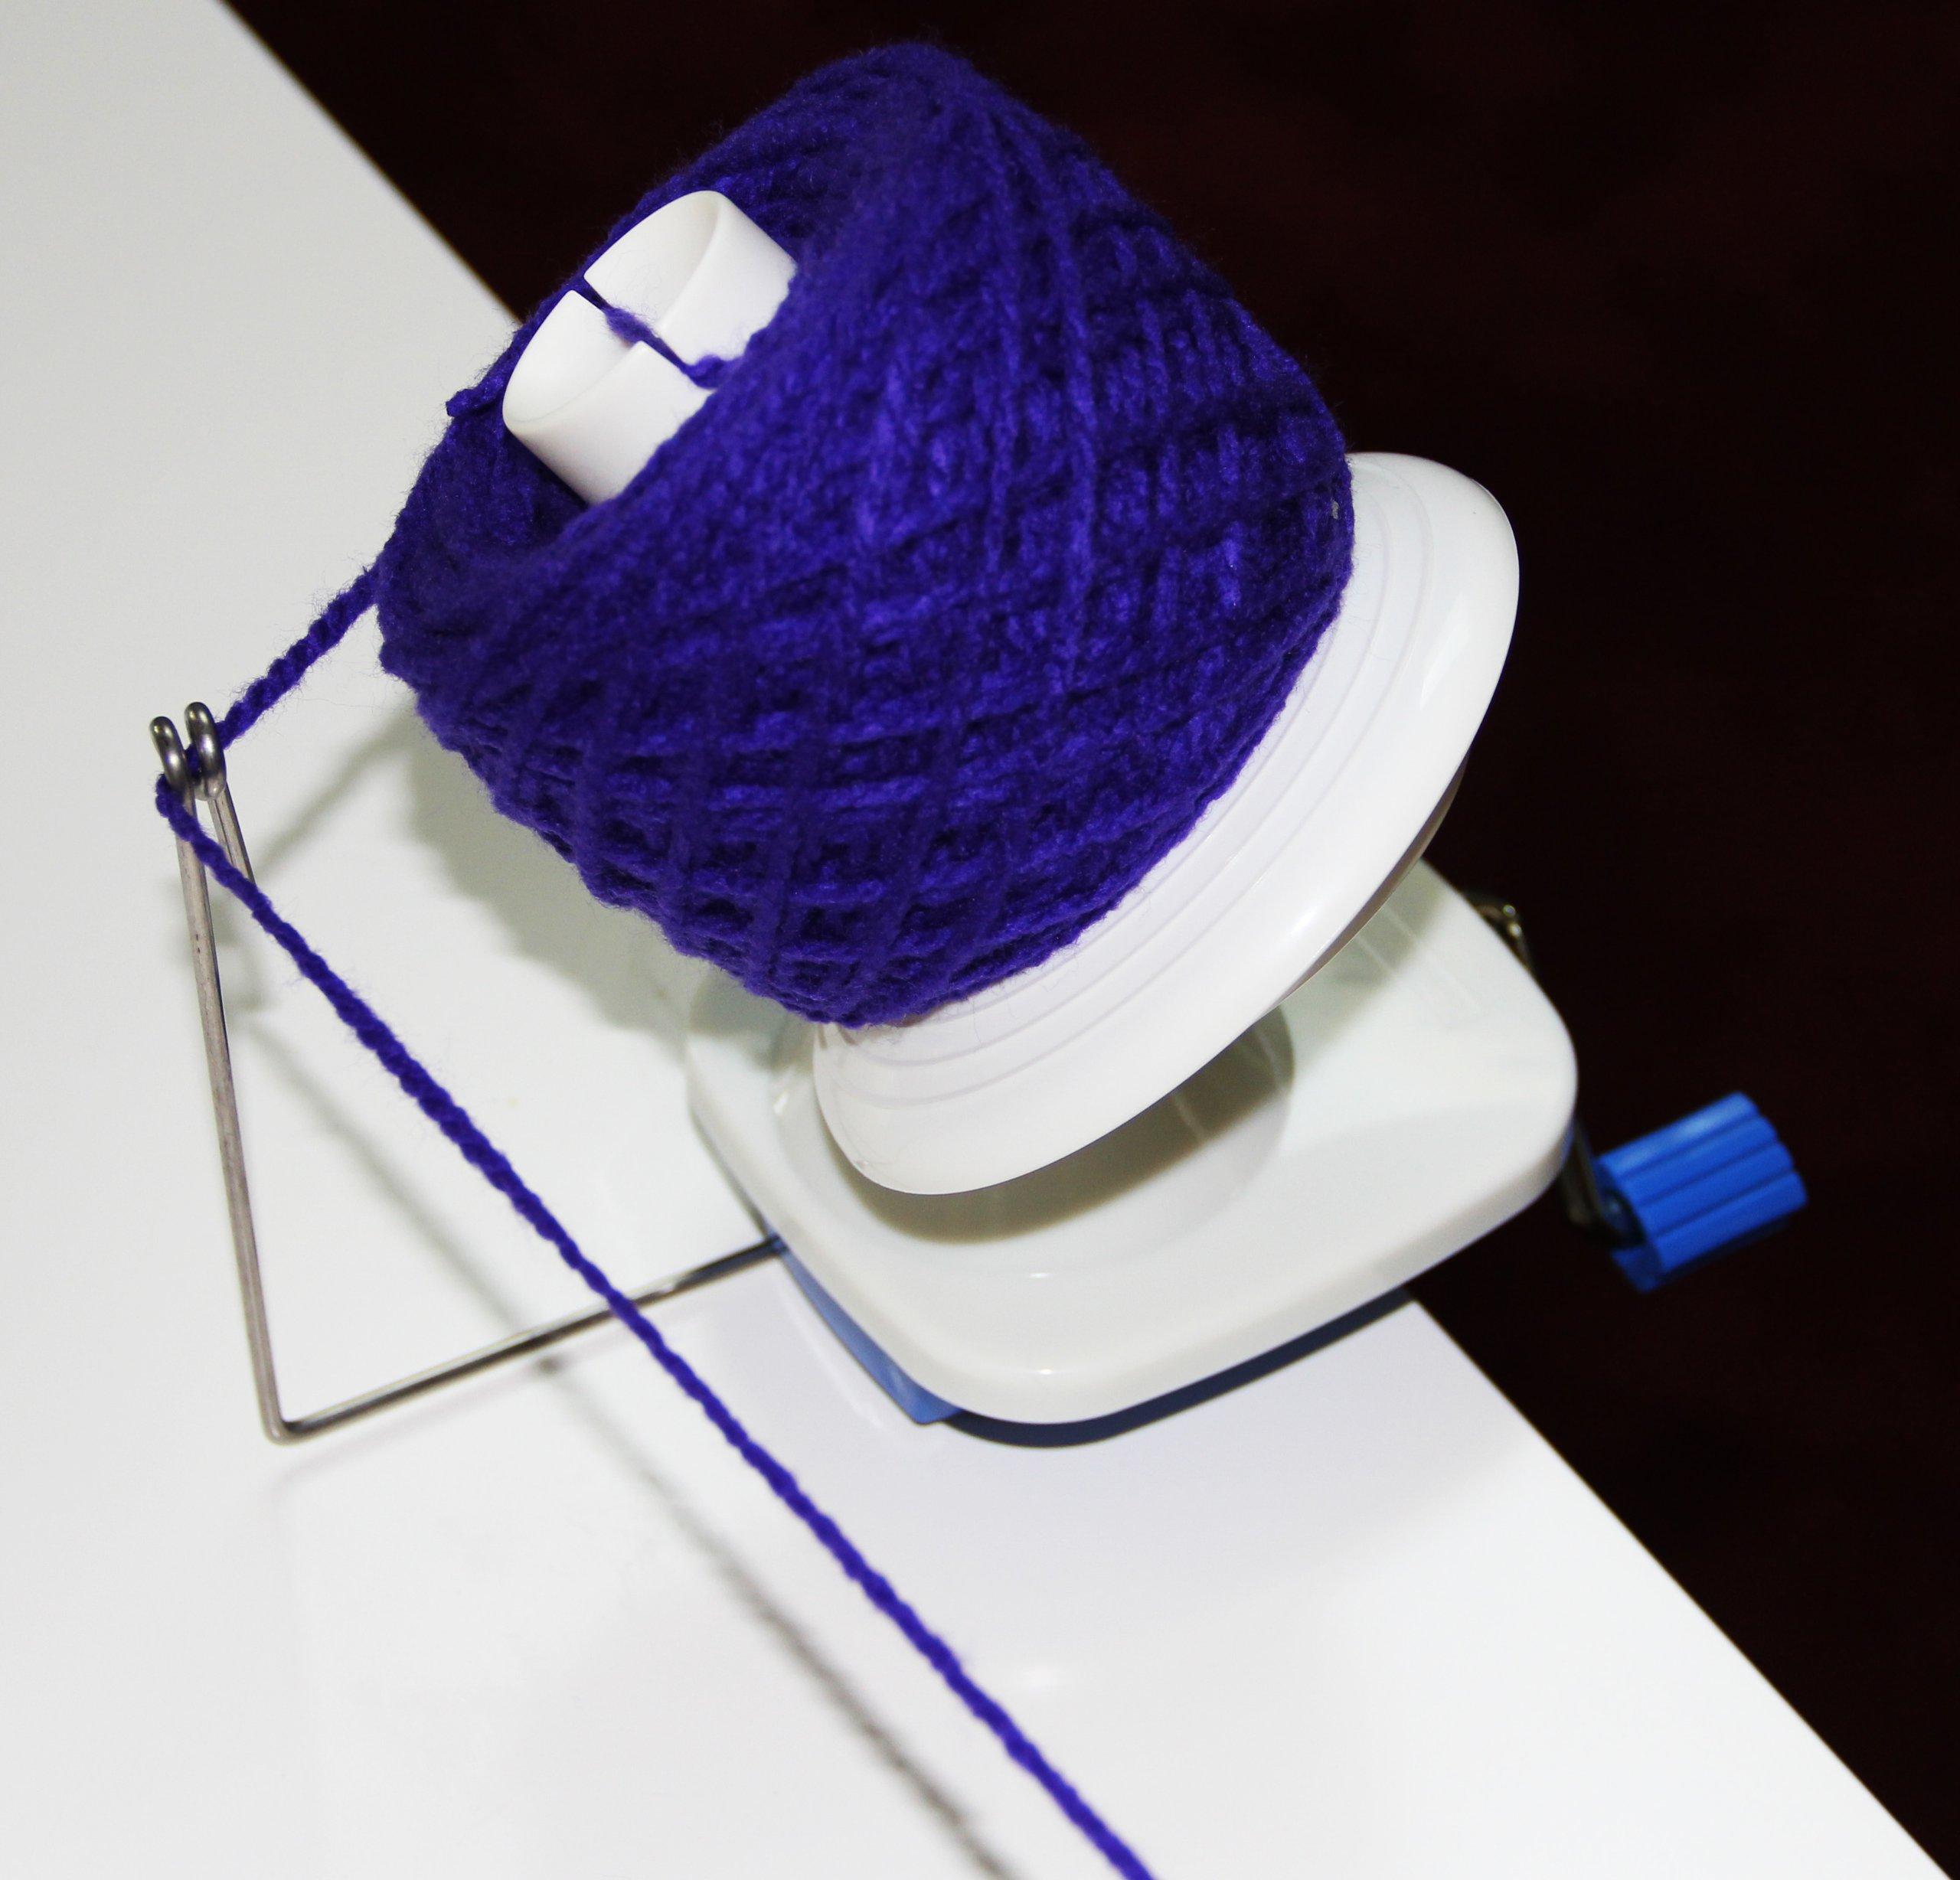 Stanwood Needlecraft YBW-A Hand-Operated Yarn Ball Winder, 4-Ounce